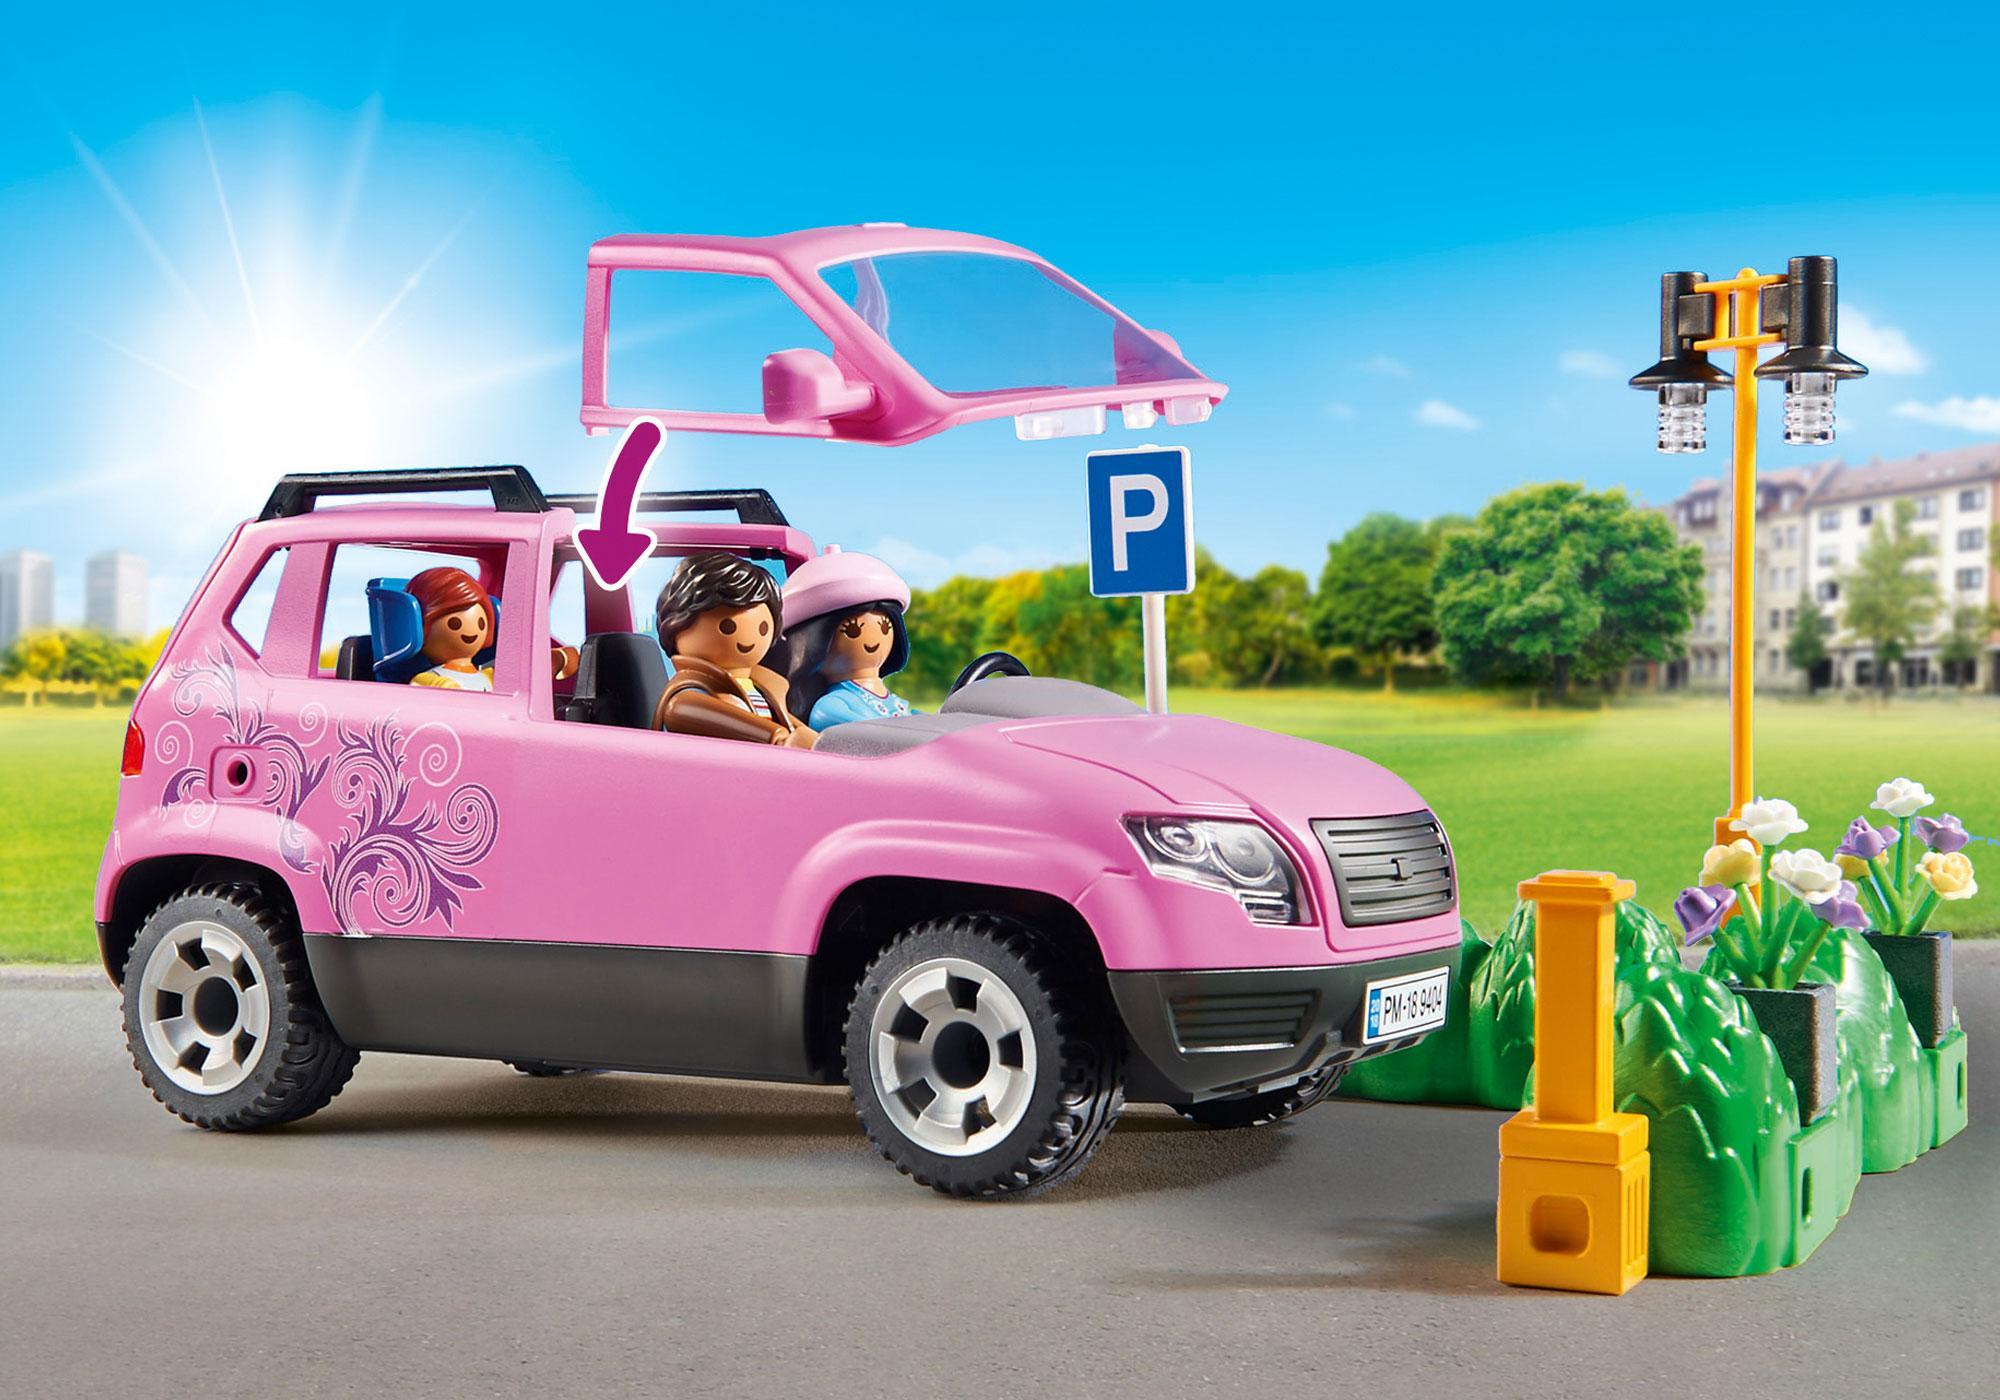 http://media.playmobil.com/i/playmobil/9404_product_extra2/Familien-PKW mit Parkbucht